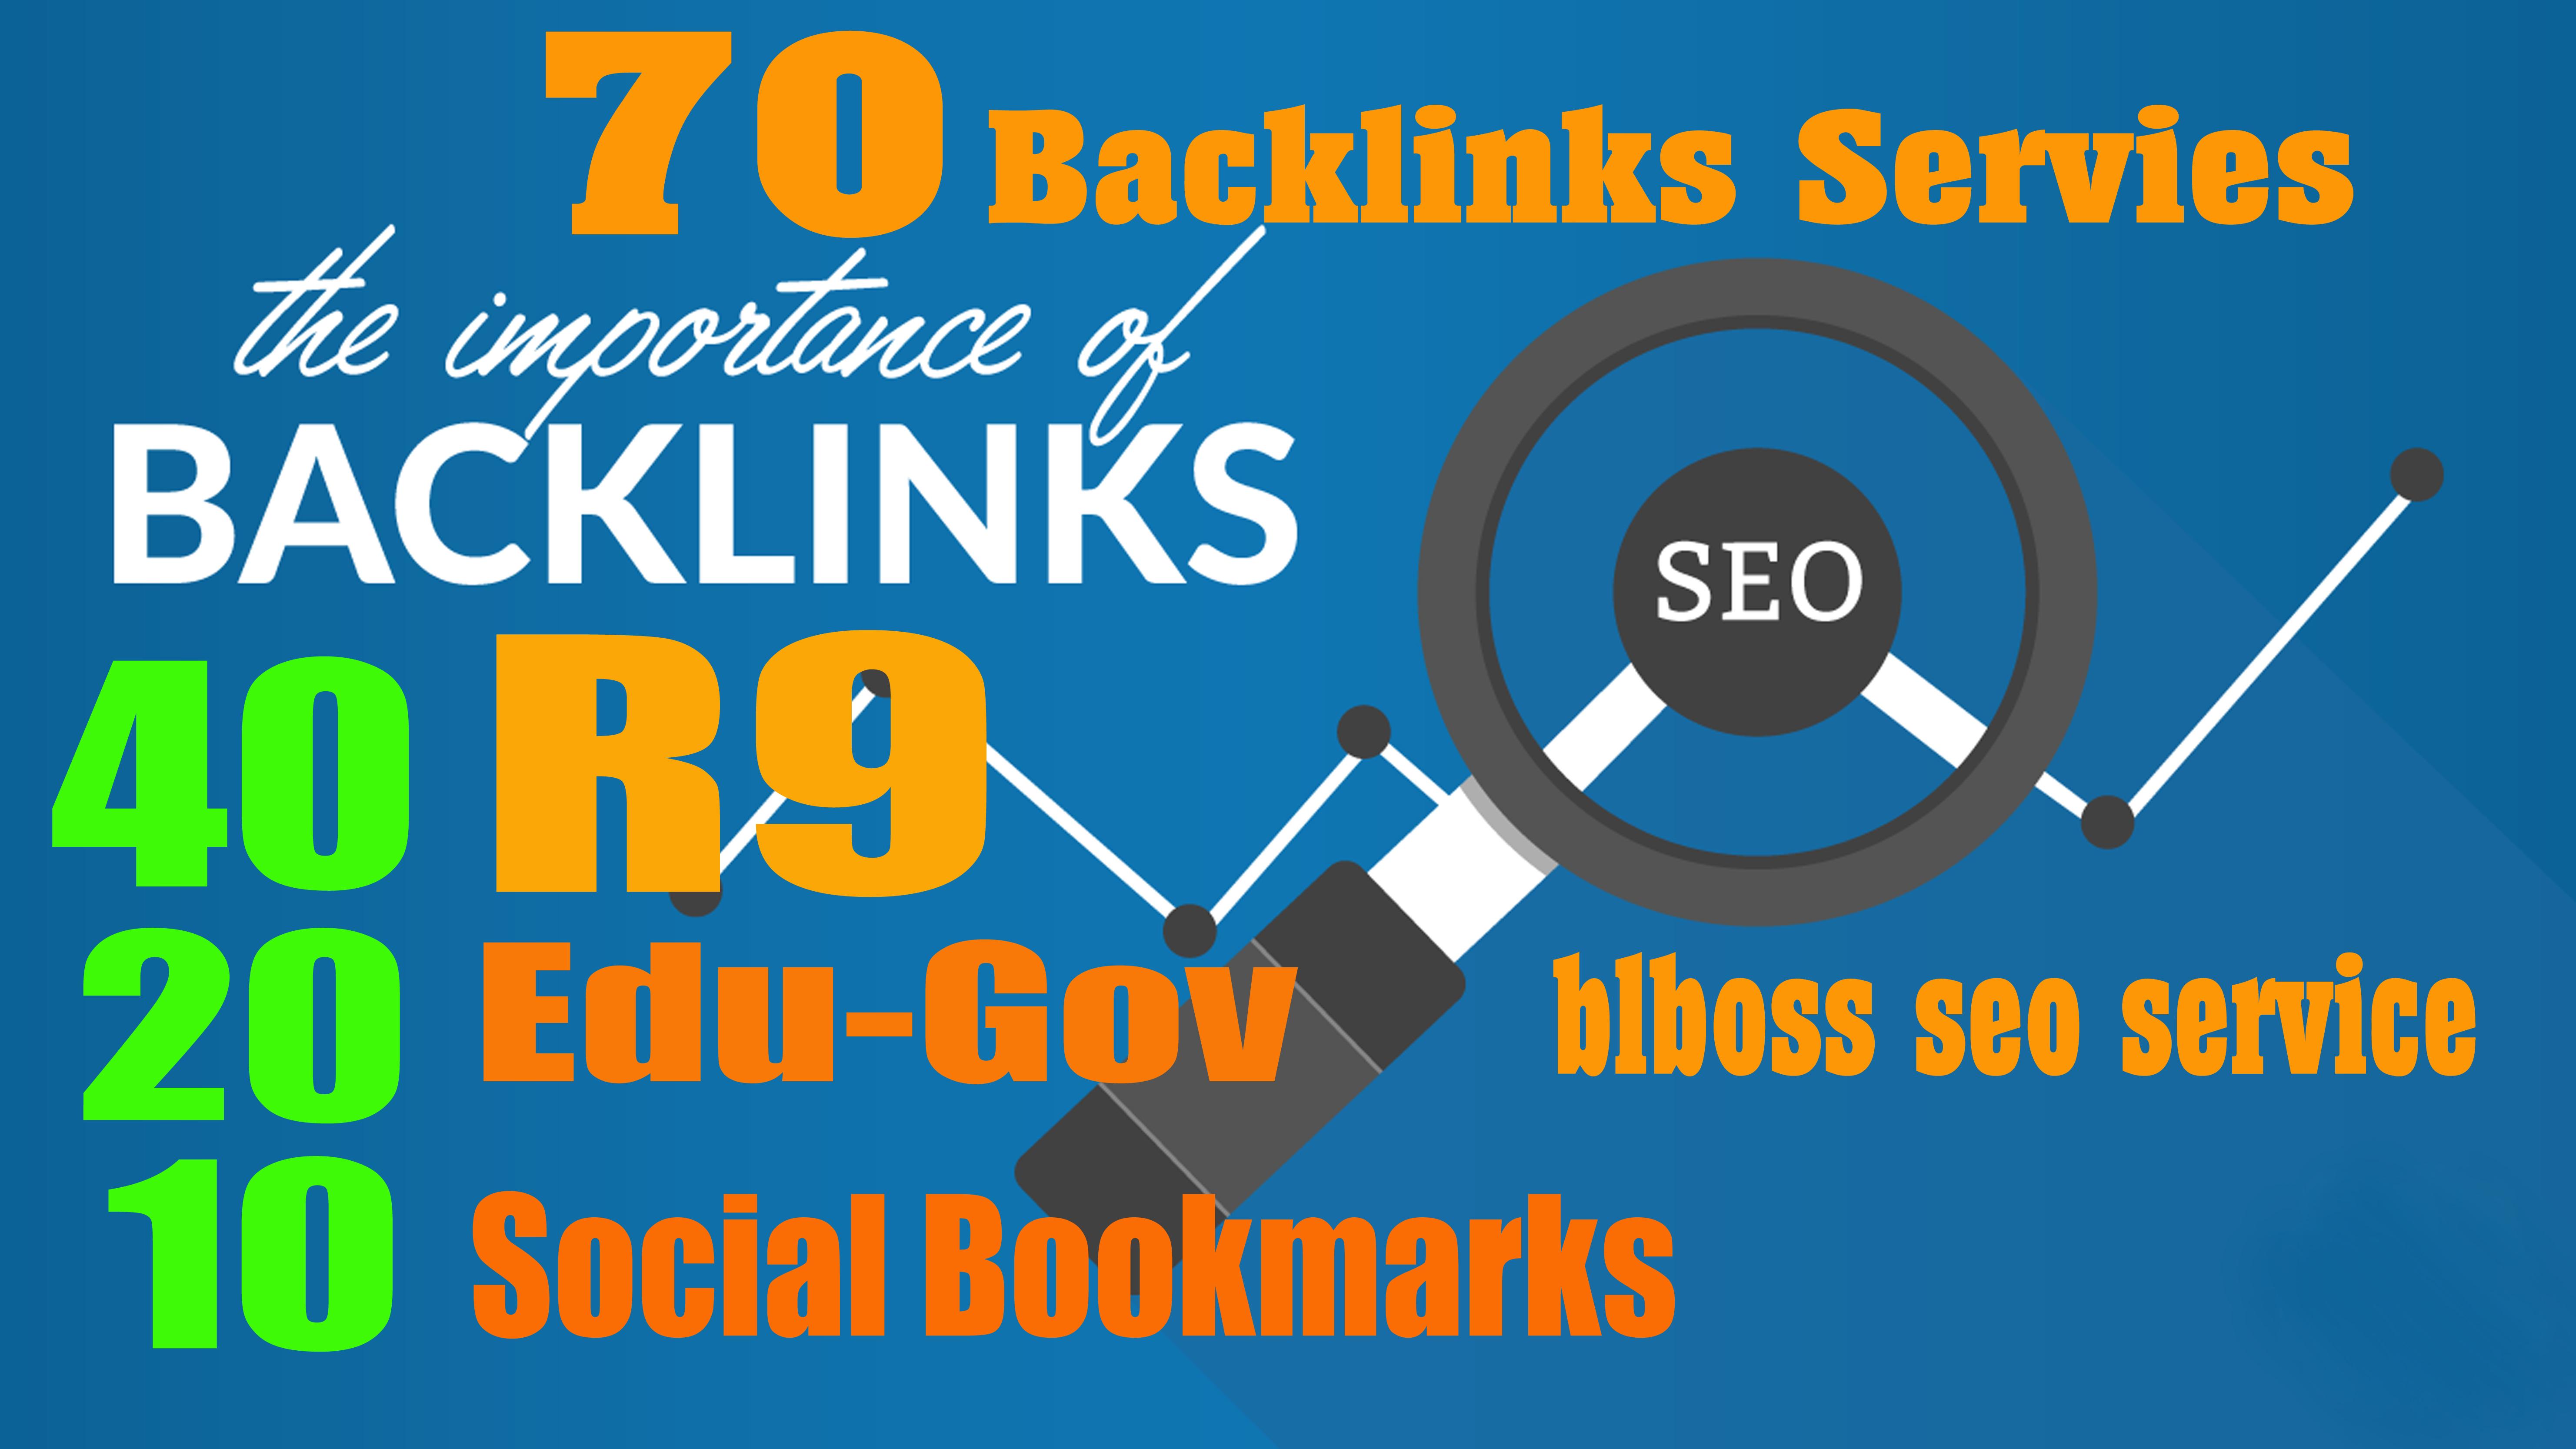 70 Backlinks from 40 PR9 + 20 EDU-GOV + 10 SOCIAL BOOKMARKS For Your Website or Blog or YouTube